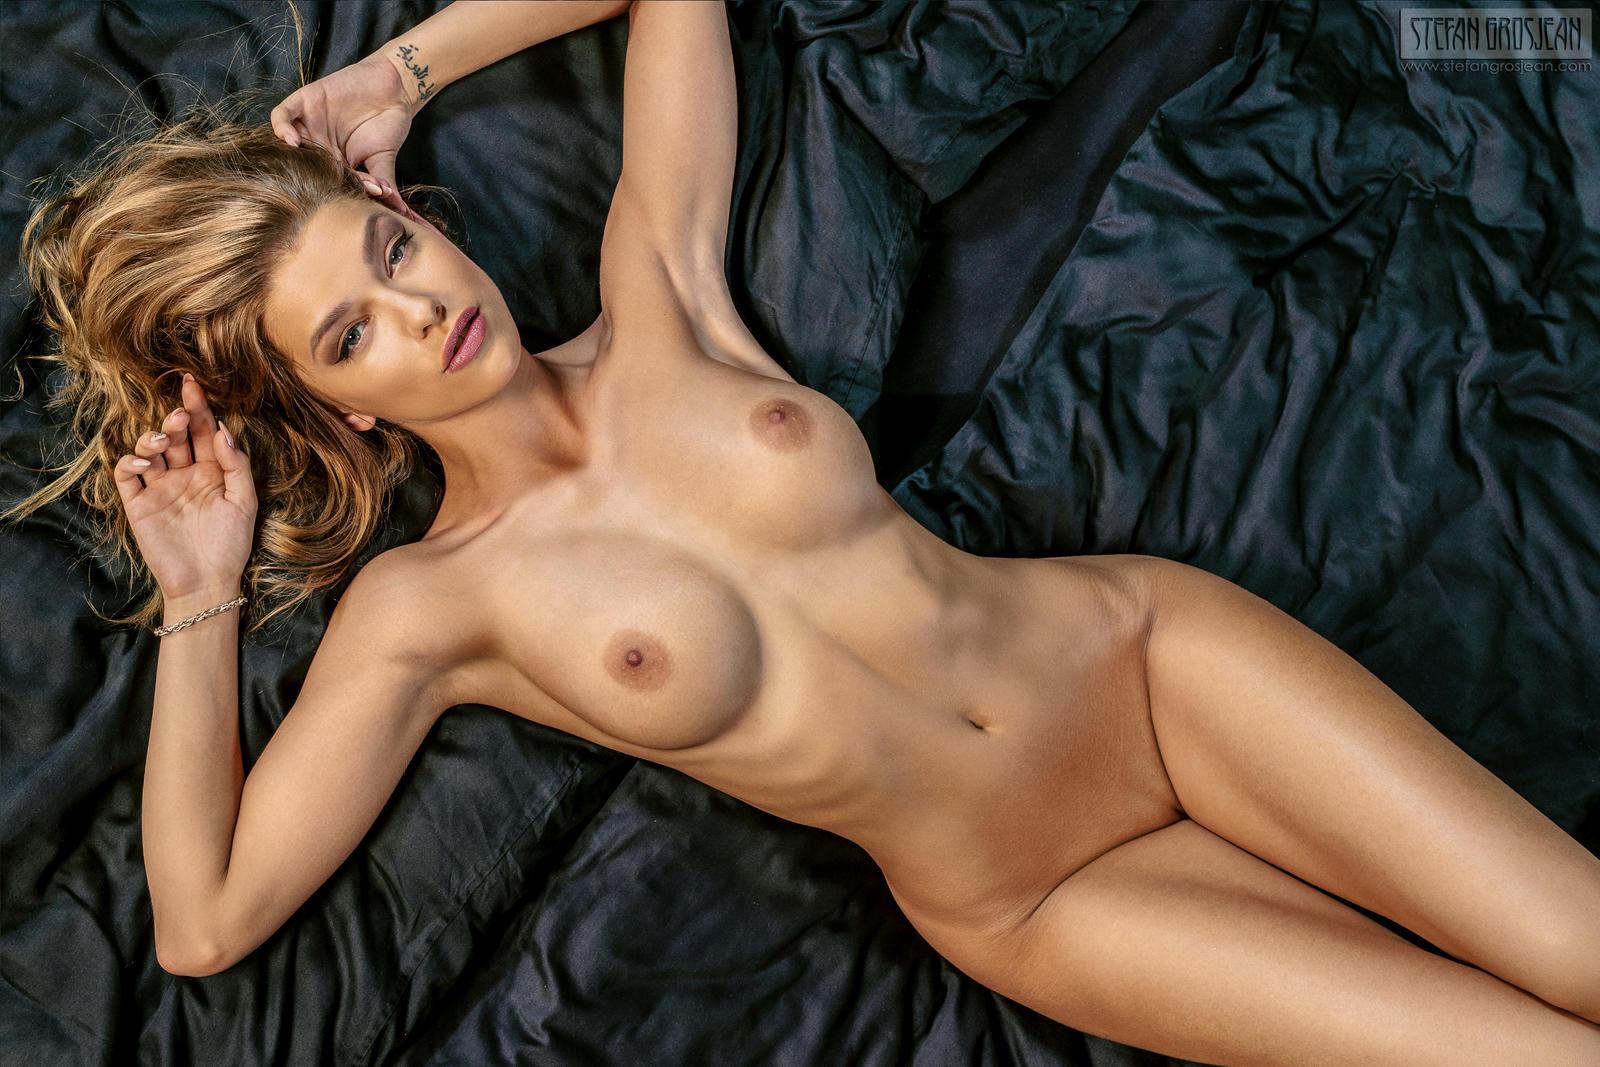 Erotismo Con Arte Una Nueva Mirada Stefan Grosjean-4119